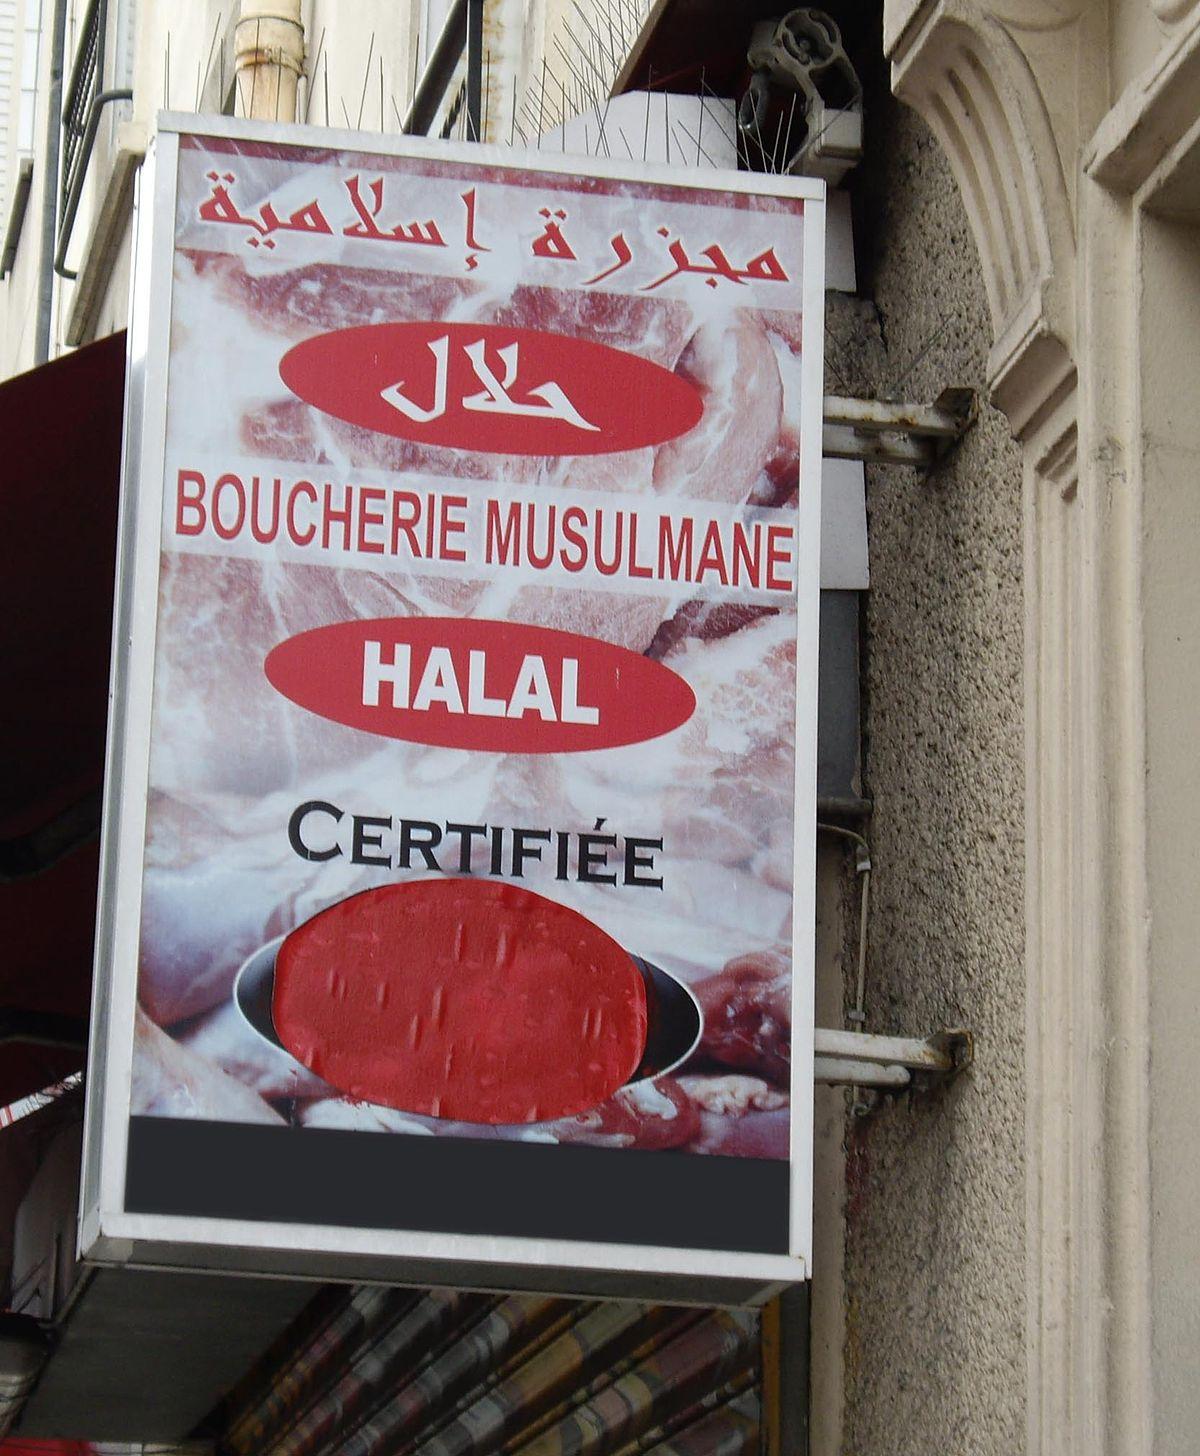 Dansk muslimsk rencontres Top sites de rencontres à Hyderabad